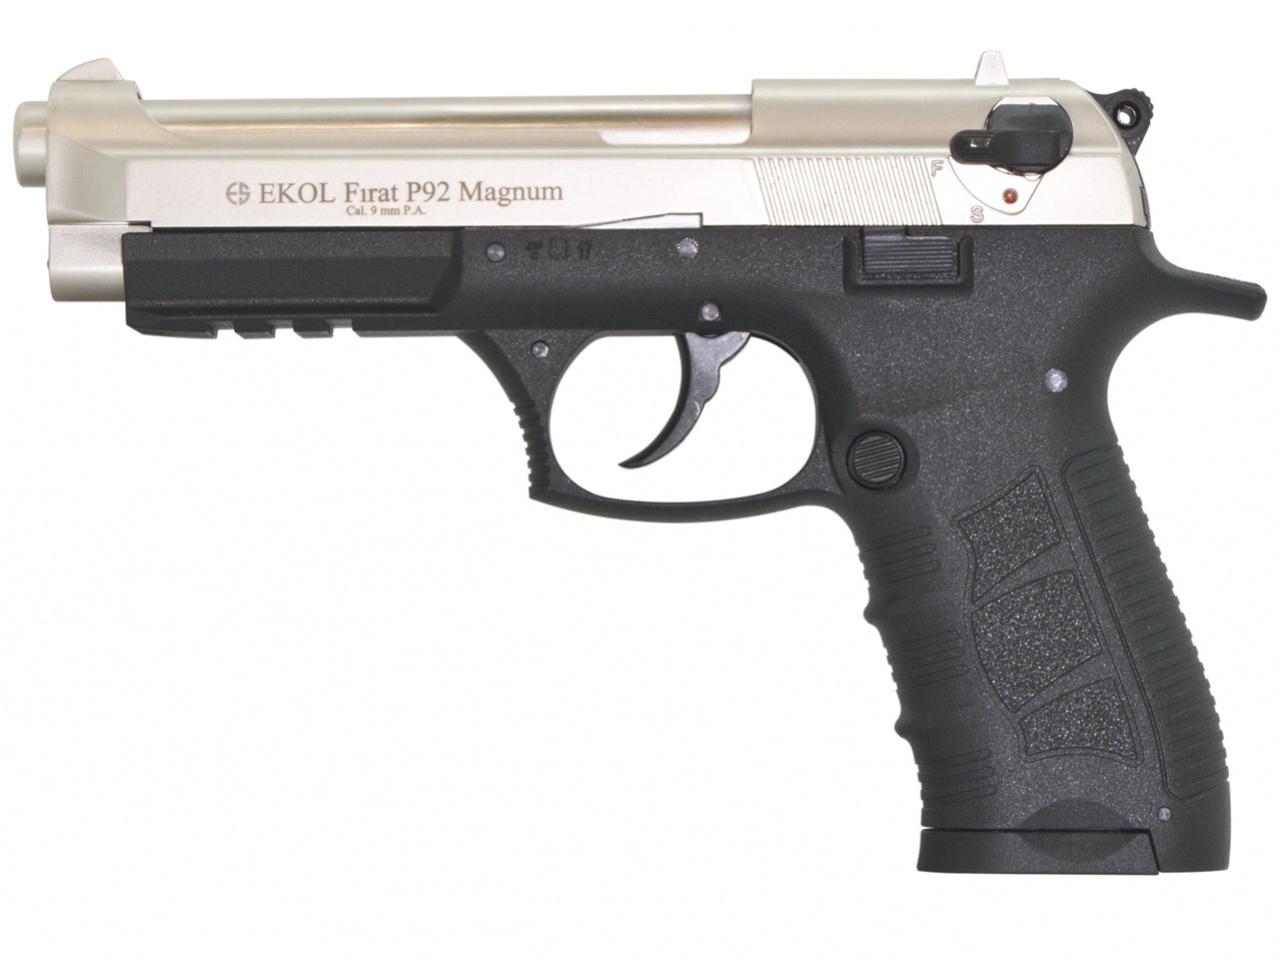 Pistolet gazowy Ekol Firat Magnum P92 satyn kal.9mm